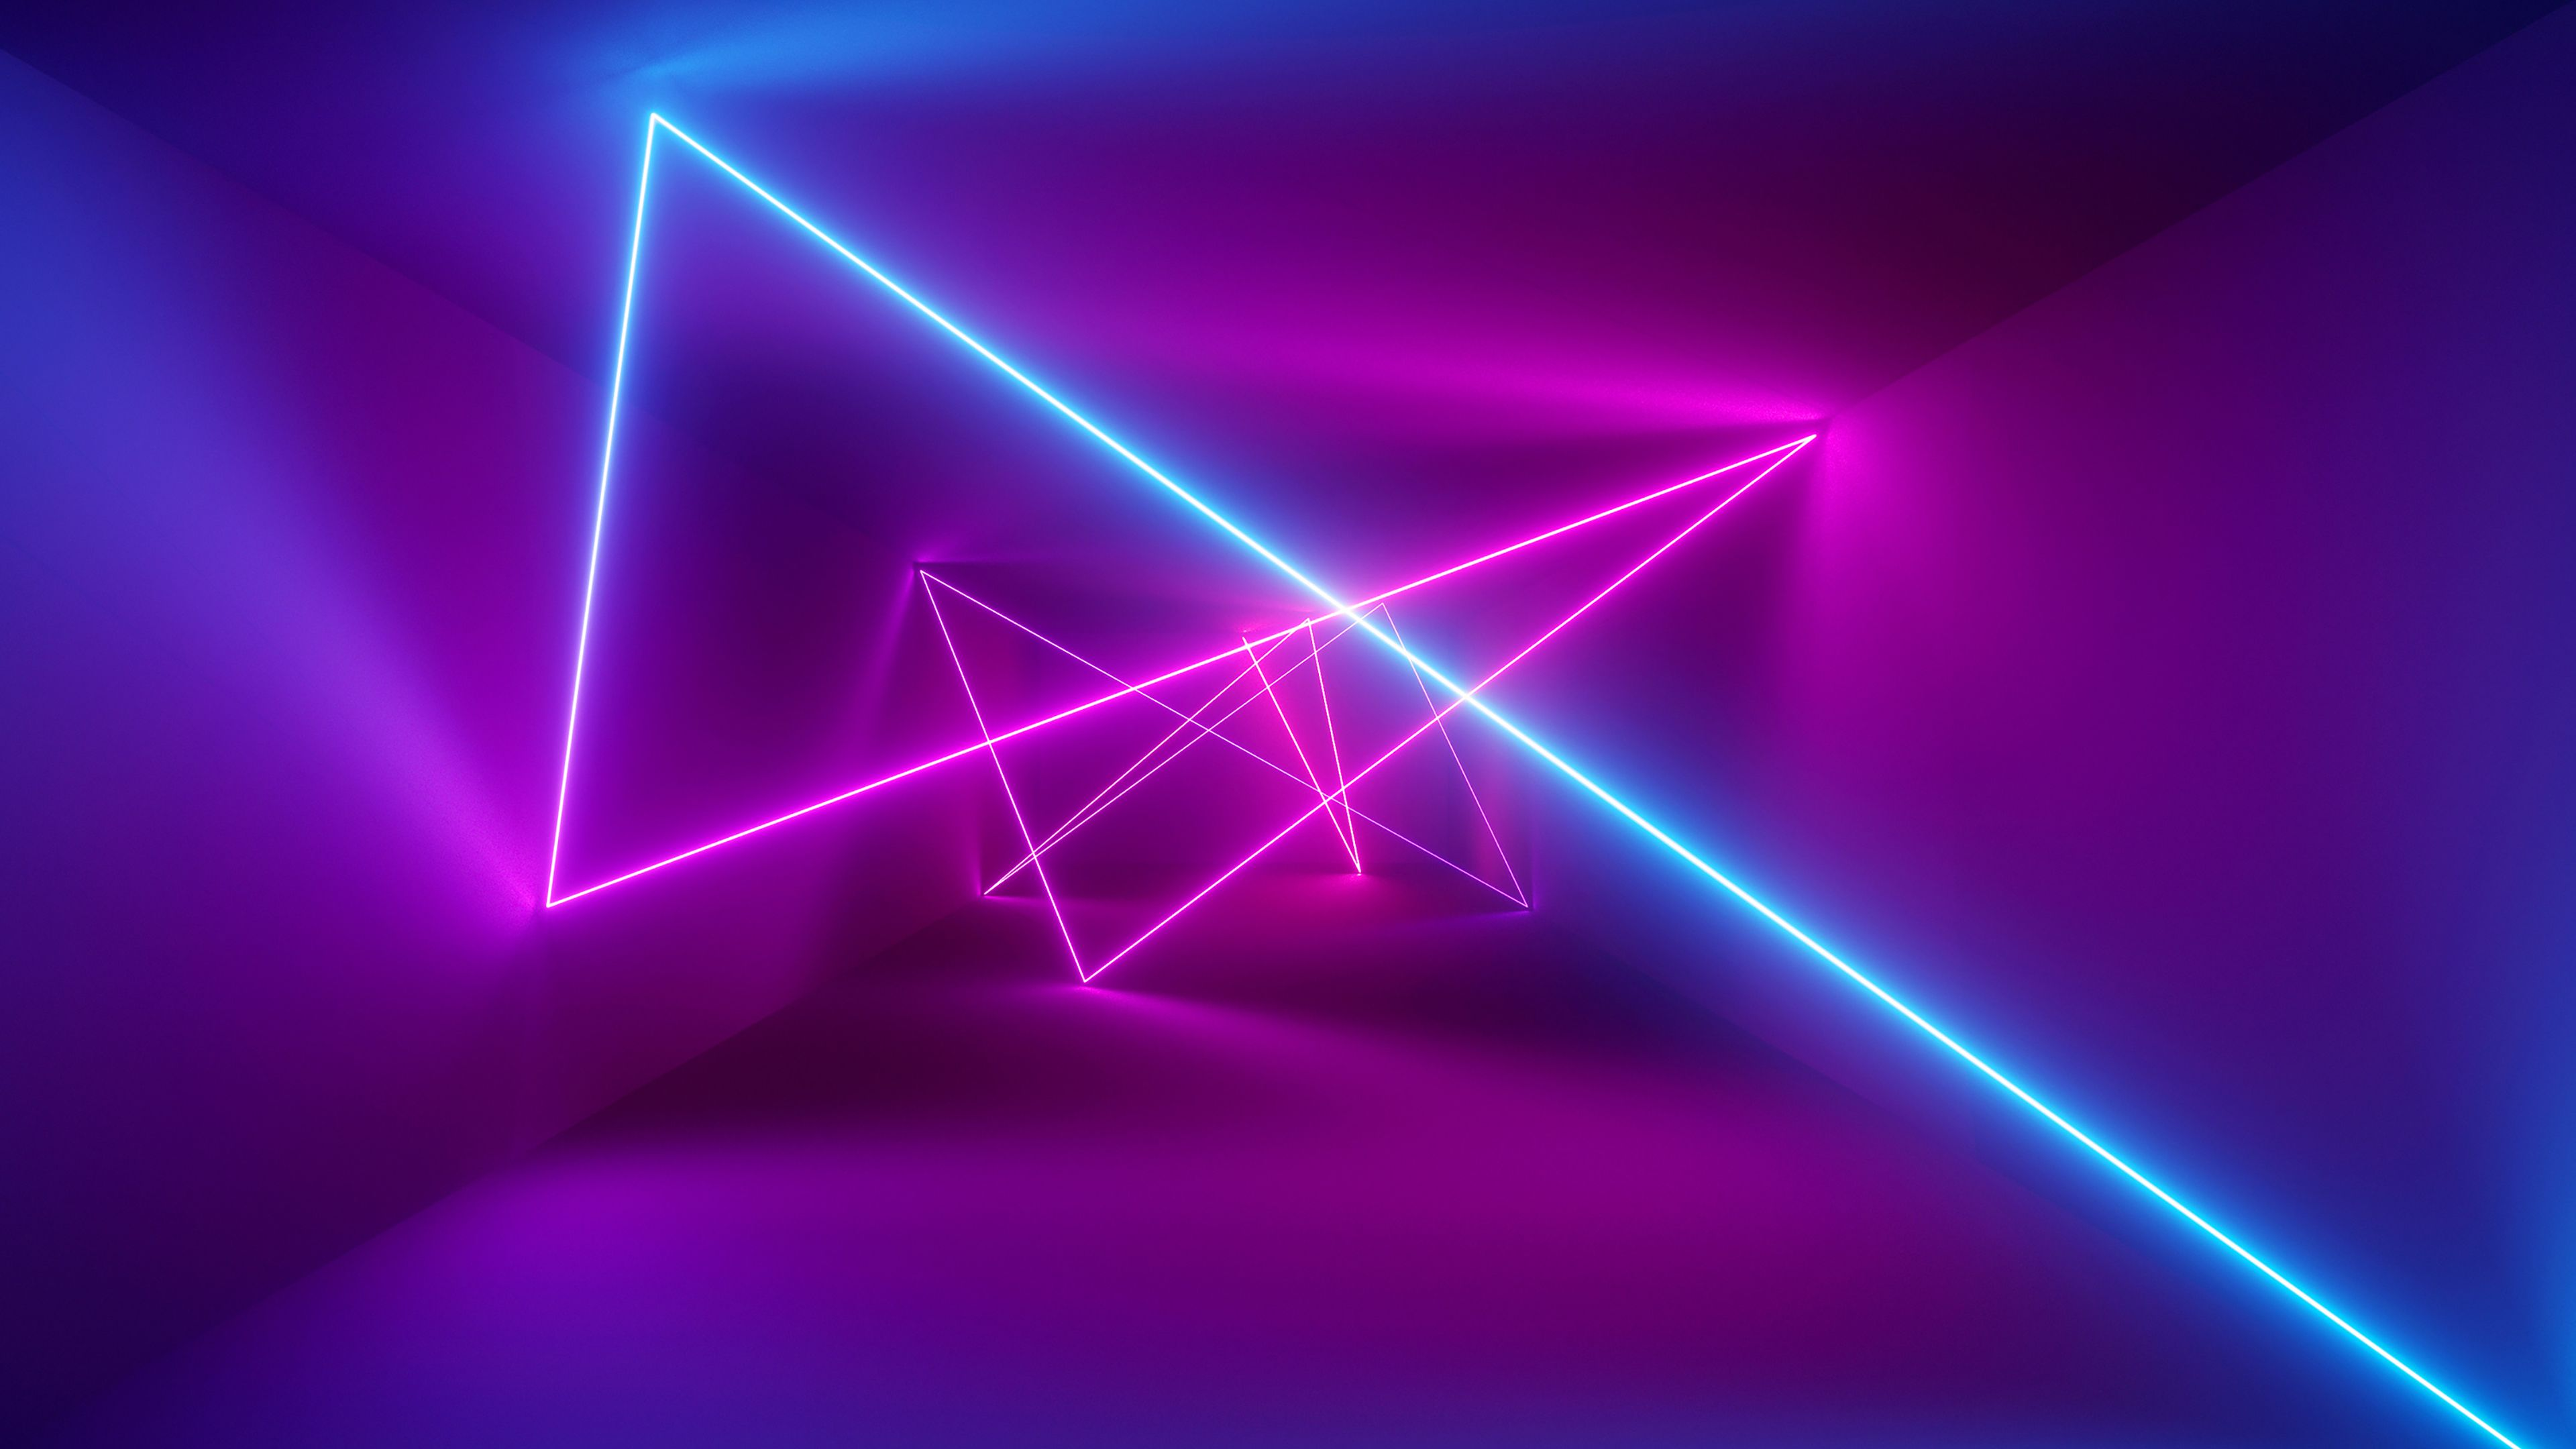 Blue And Pink Laser Beams 3840x2160 Neon Papeis De Parede Computador Layout De Cartaz